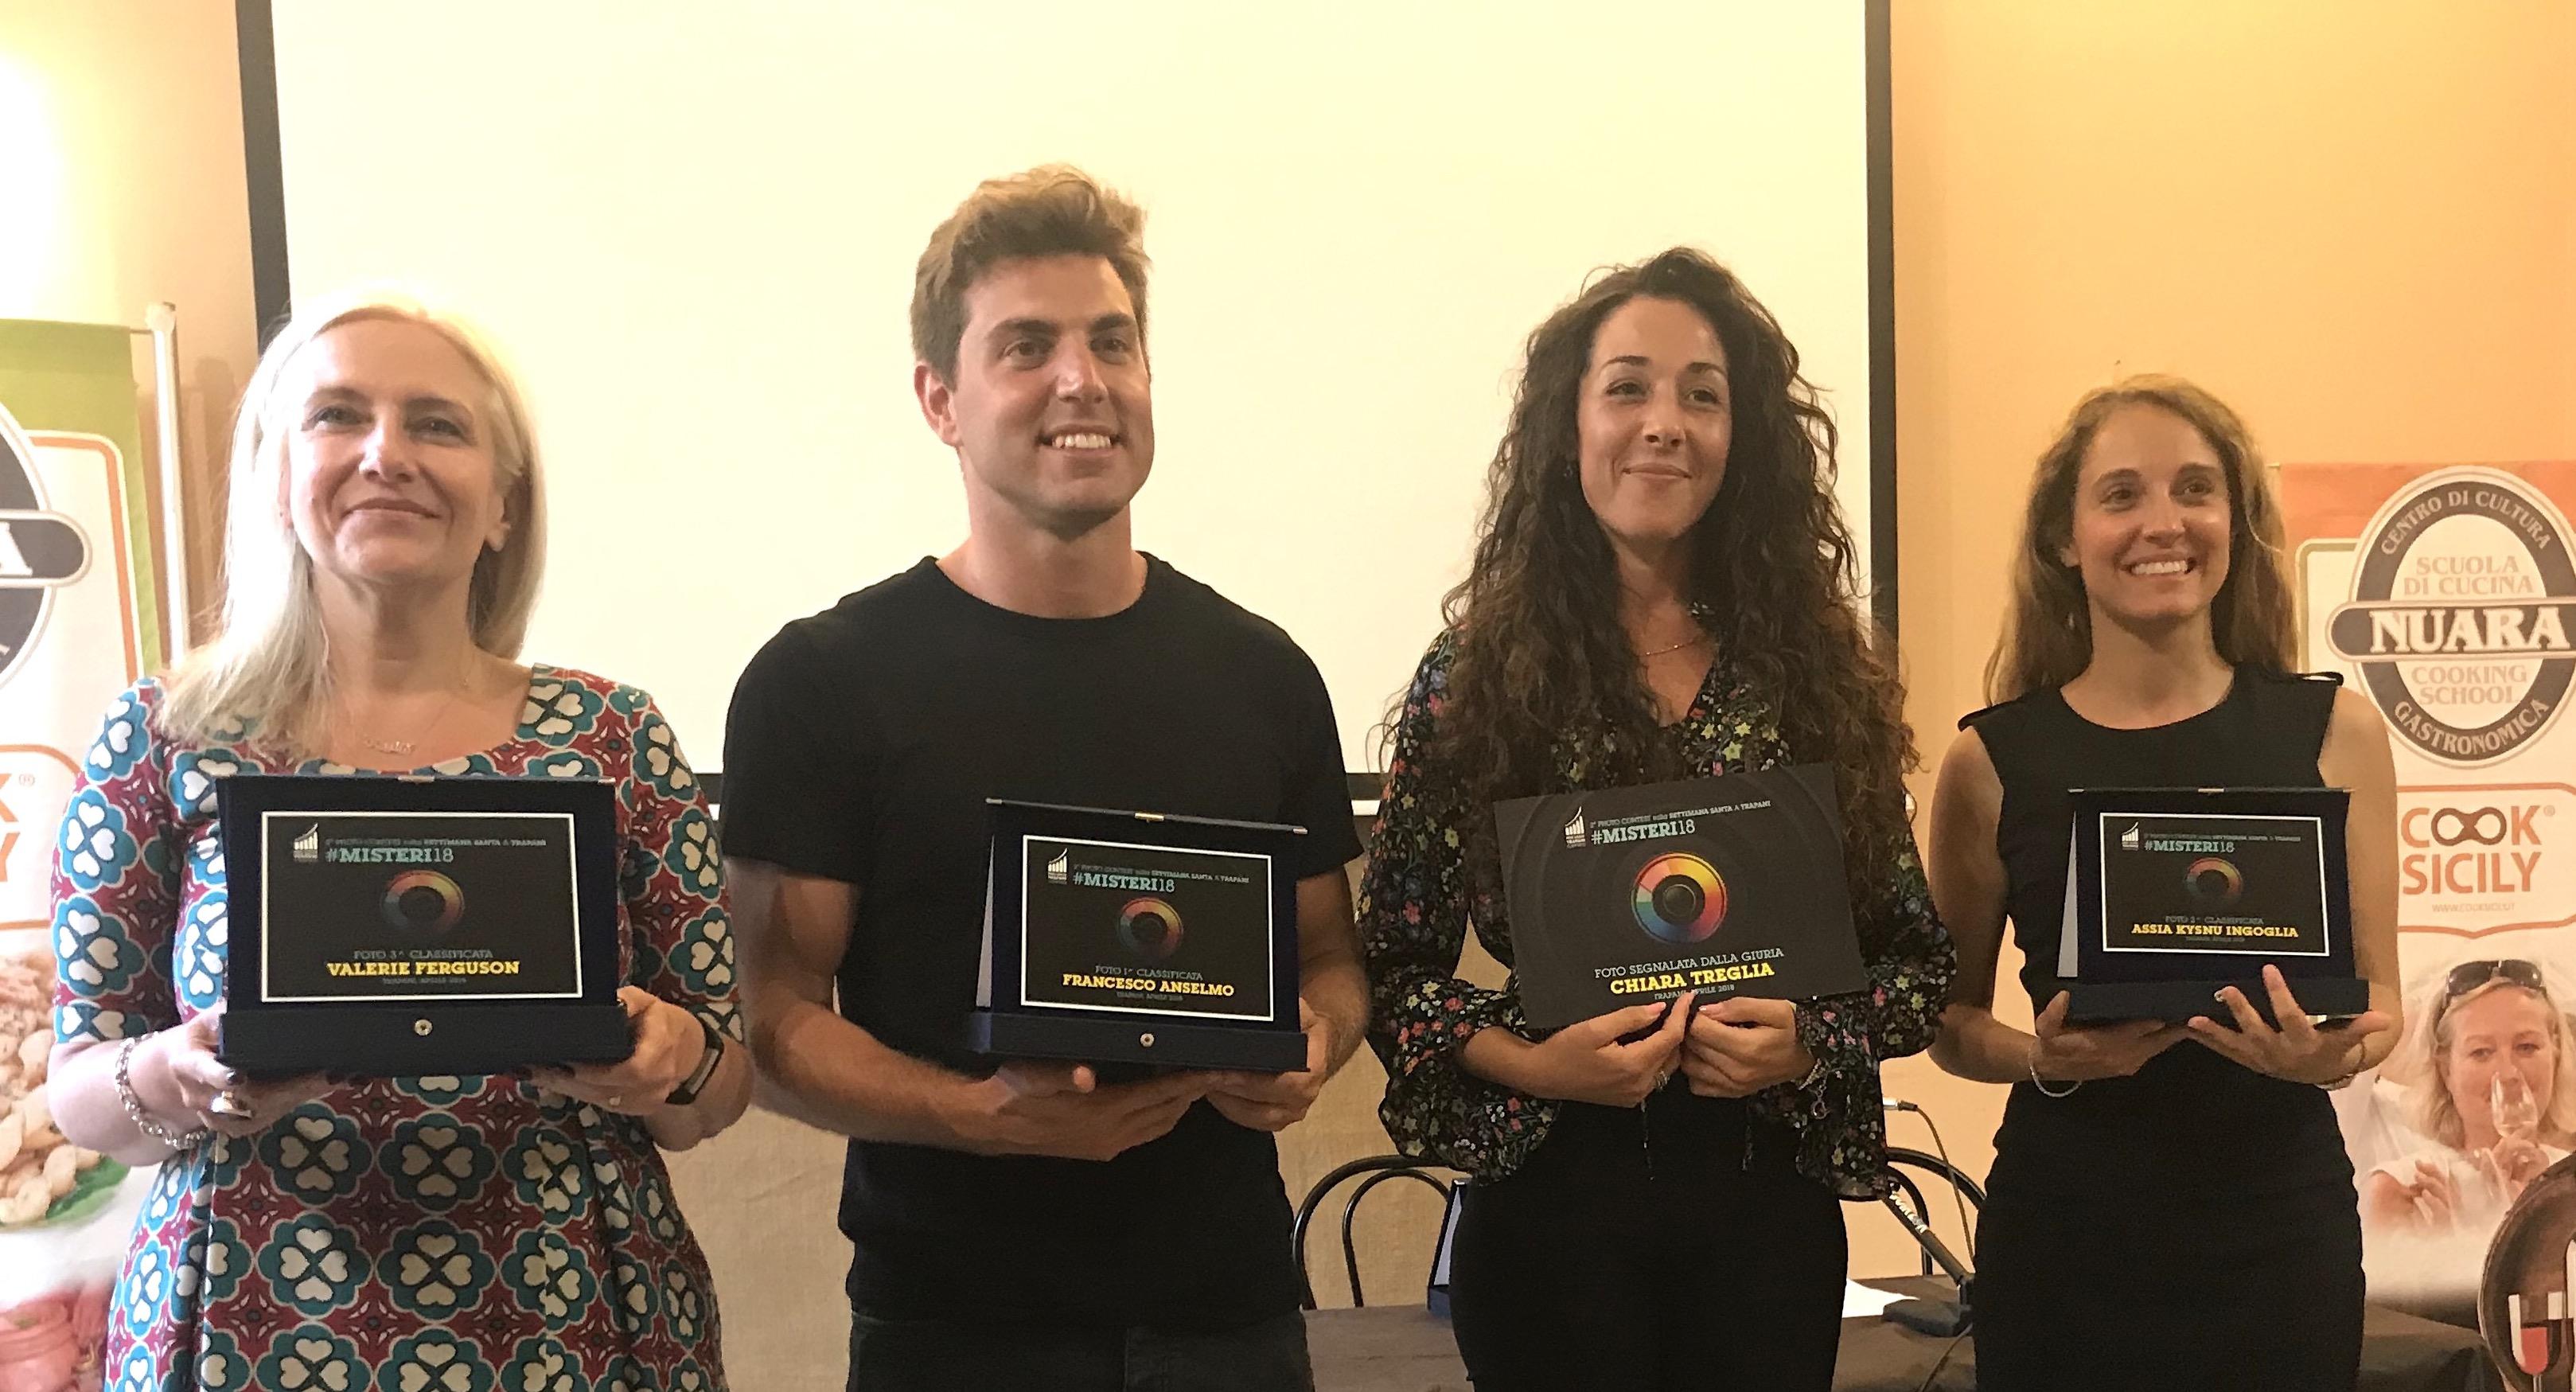 I premiati da sinistra Valerie Ferguson, Francesco Anselmo, Chiara Treglia, Maria Emanuela Ingoglia